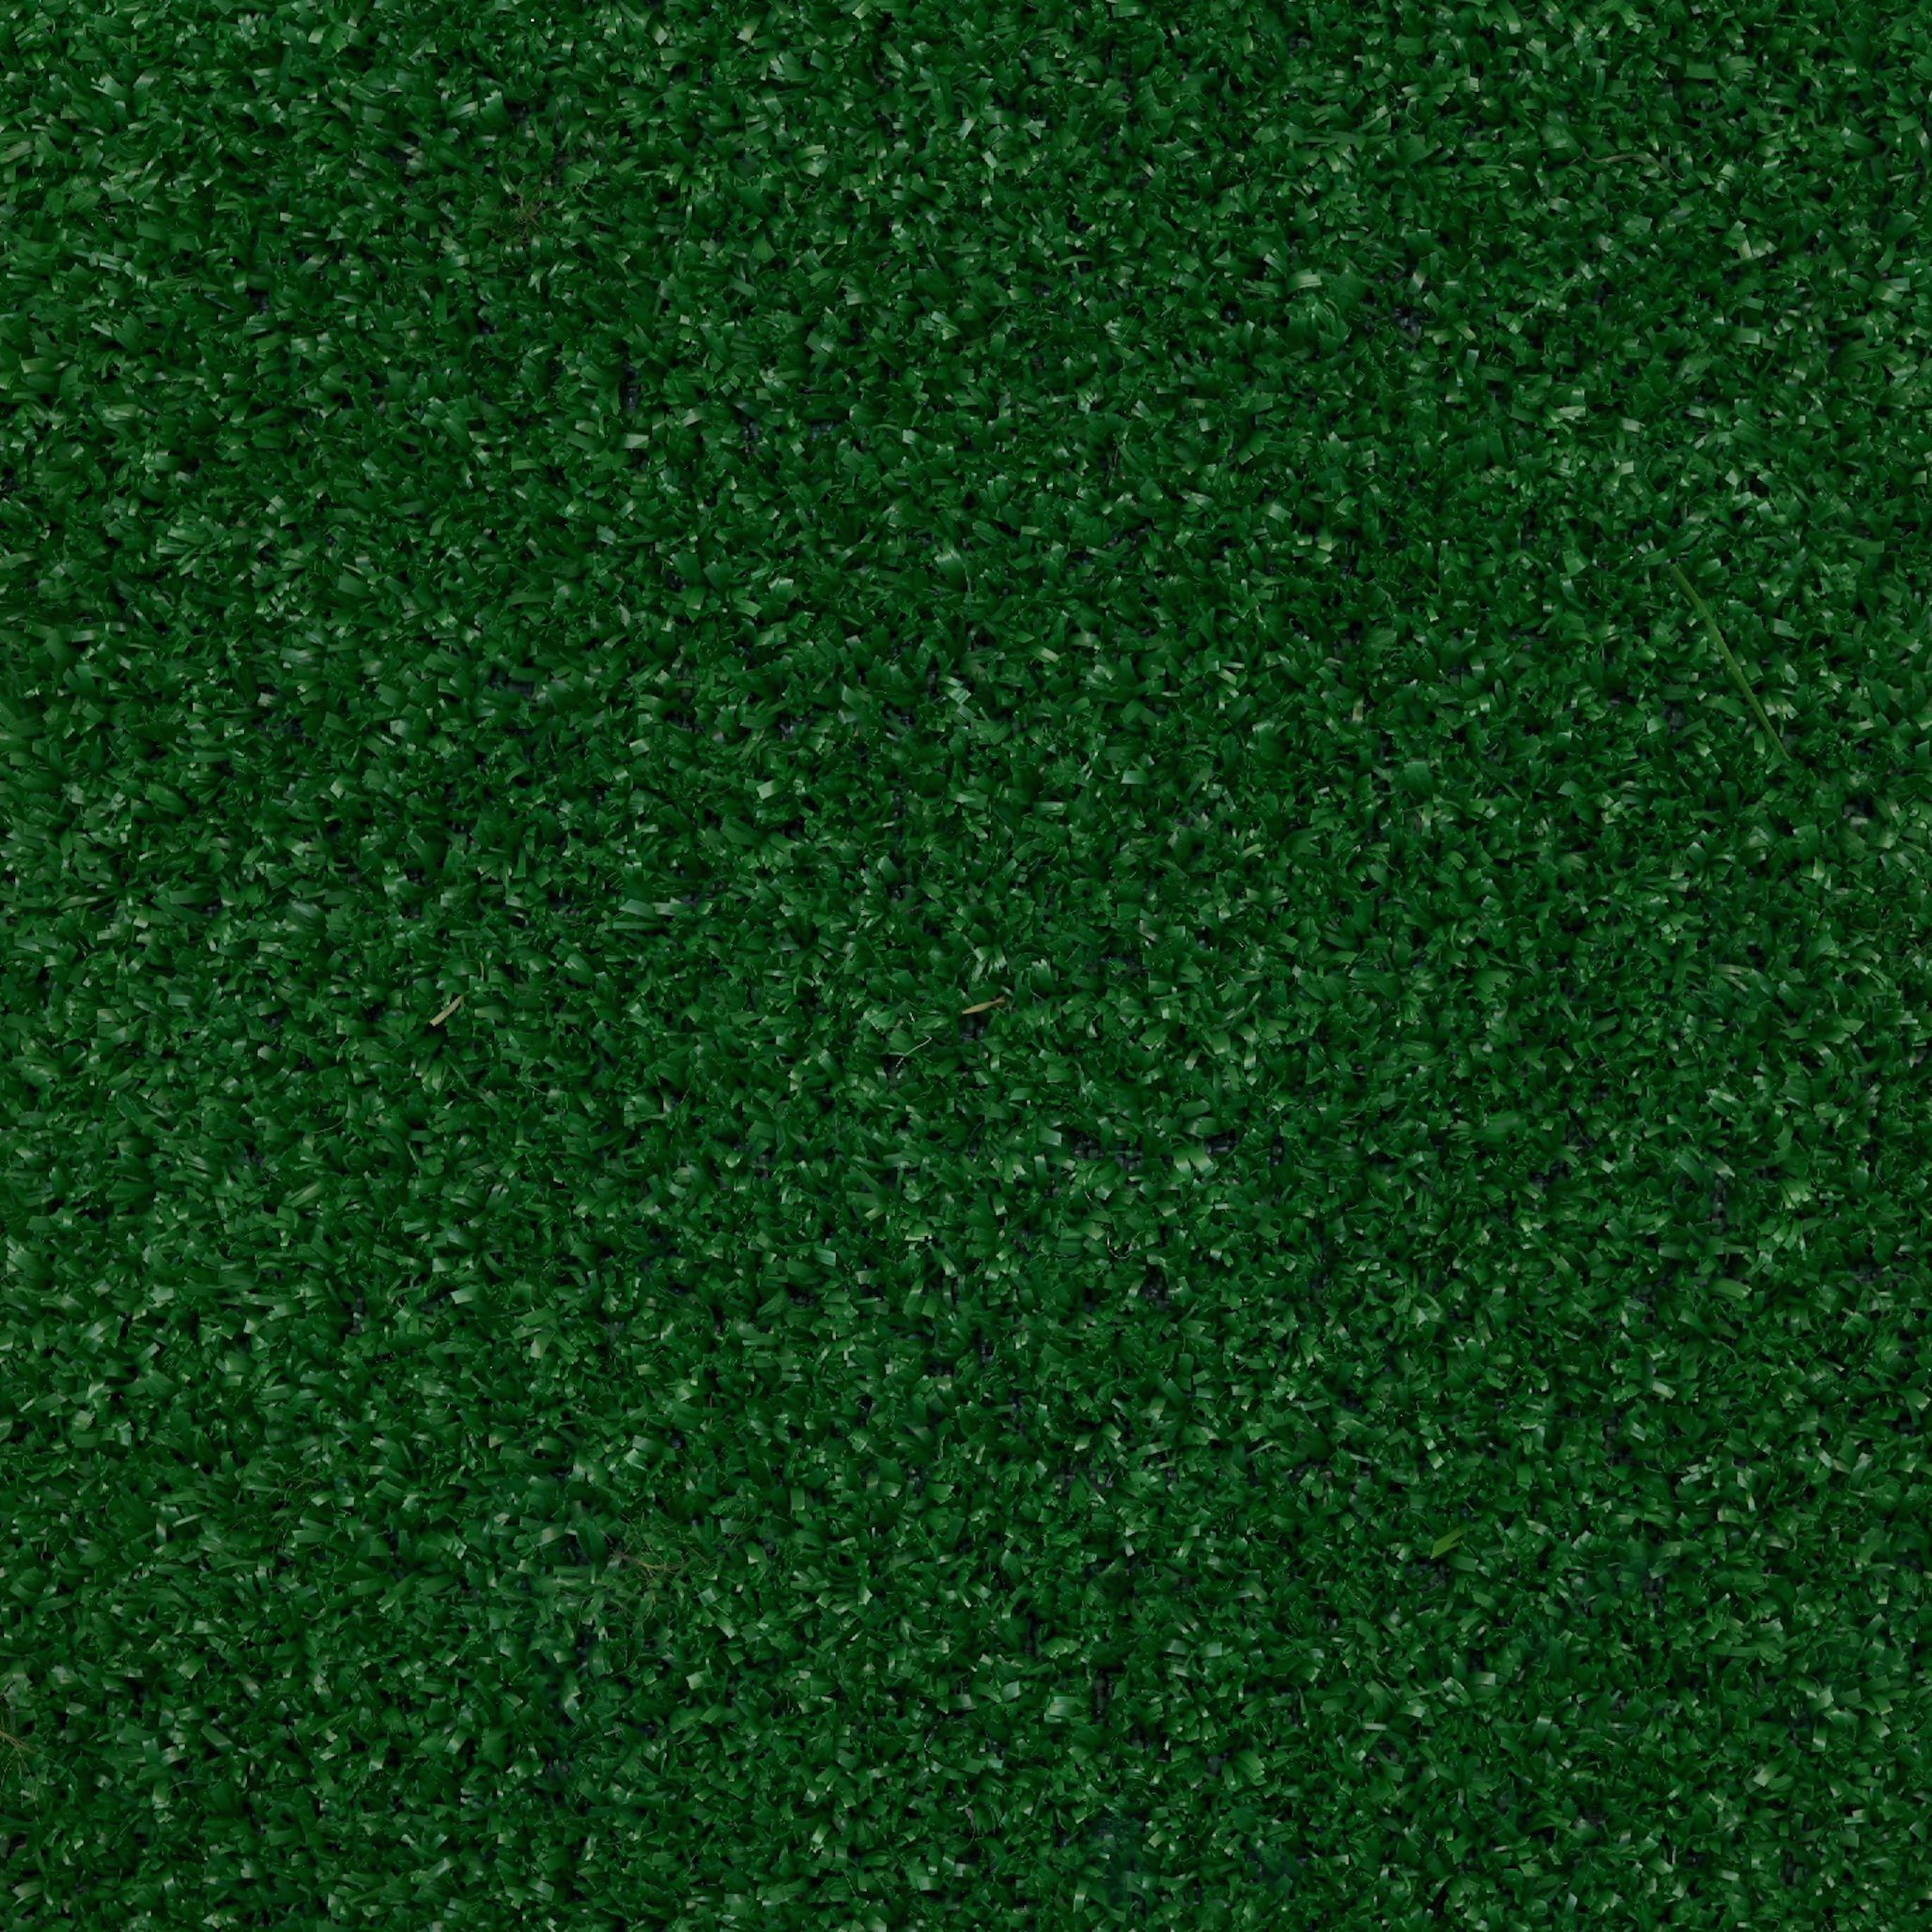 Padstow Low Density Artificial Grass W2 M X L2m X T6